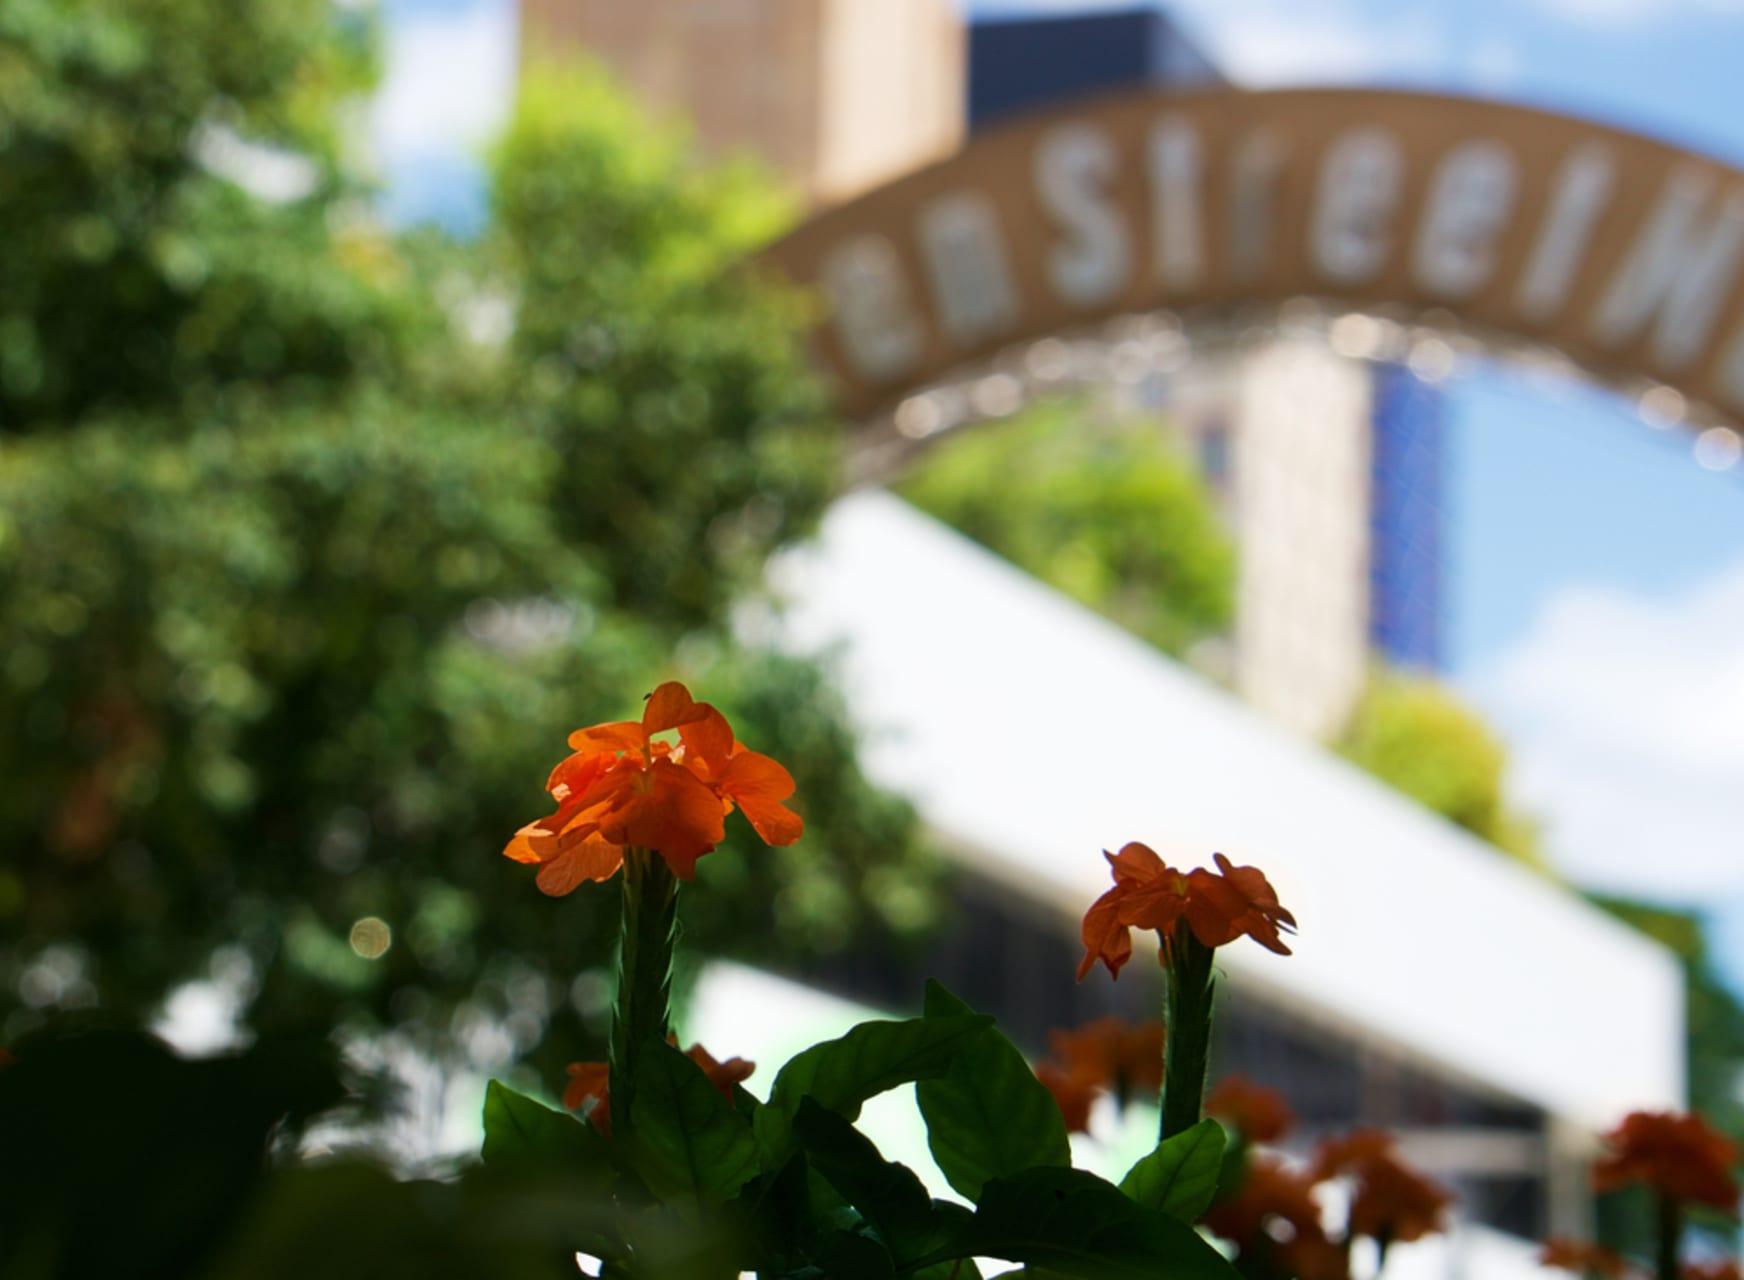 Brisbane - Queen Street Mall:  Brisbane's most famous mall